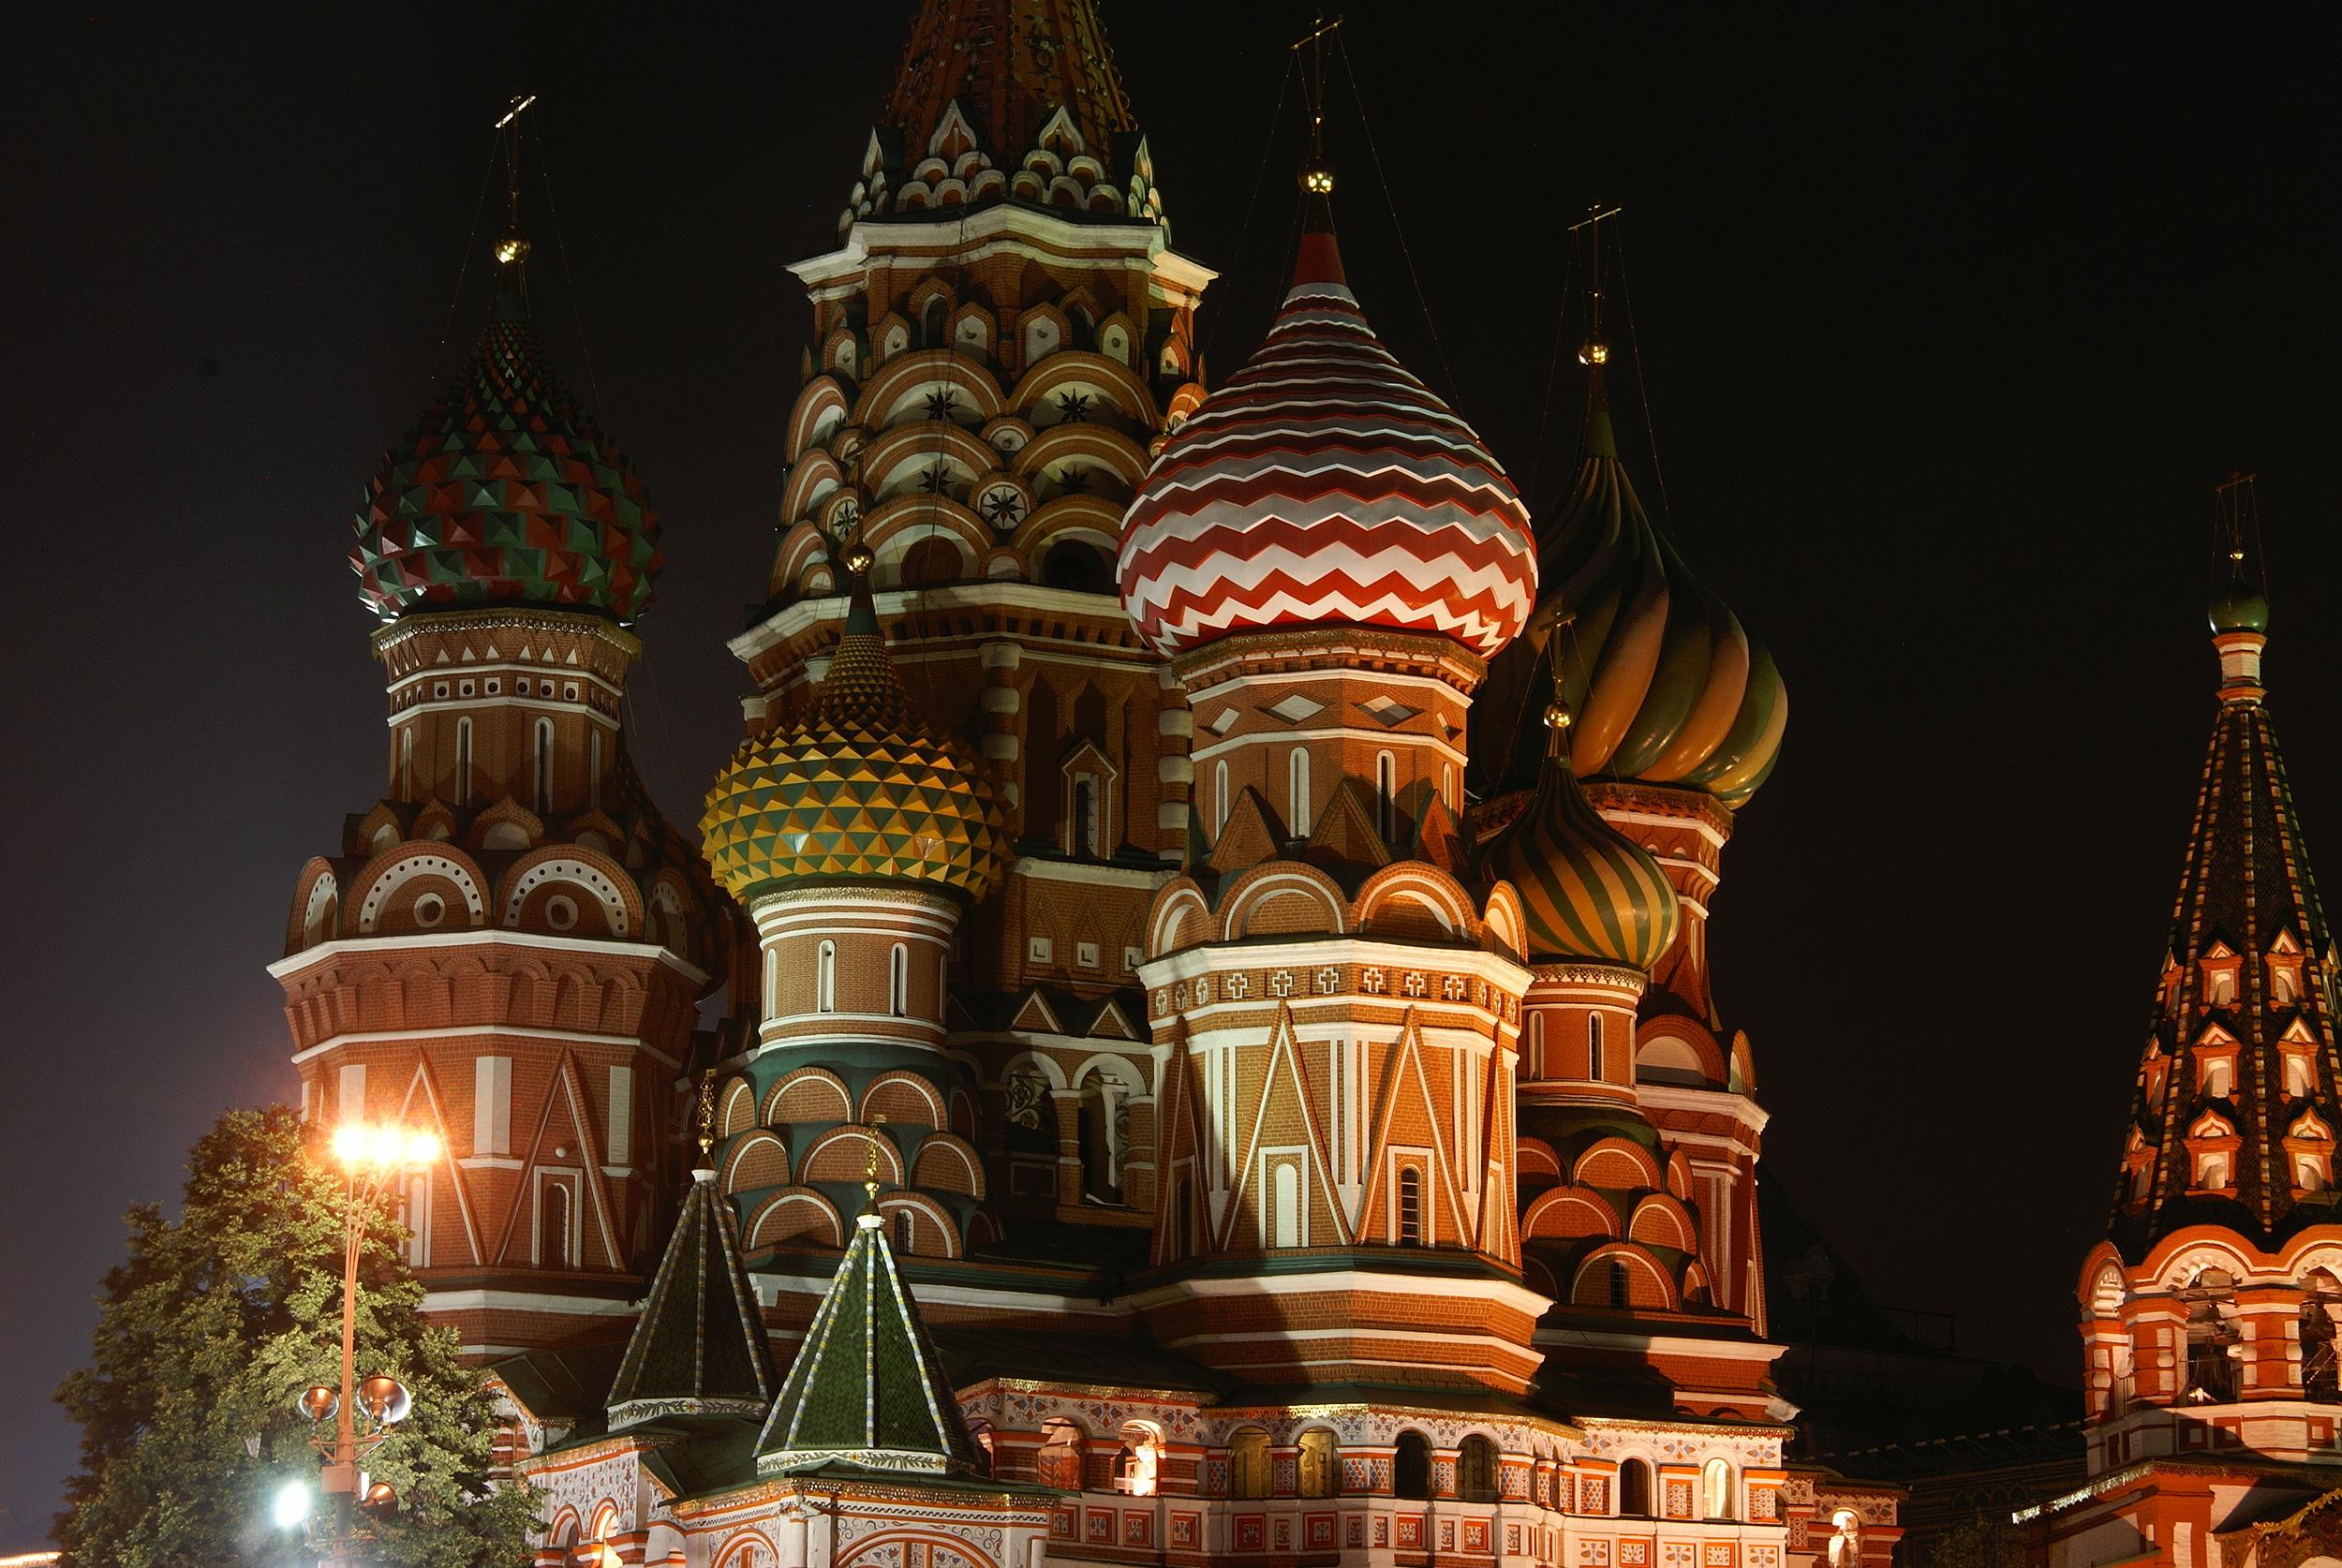 Saint_Basil_Cathedral_summer_night_closeup.jpg